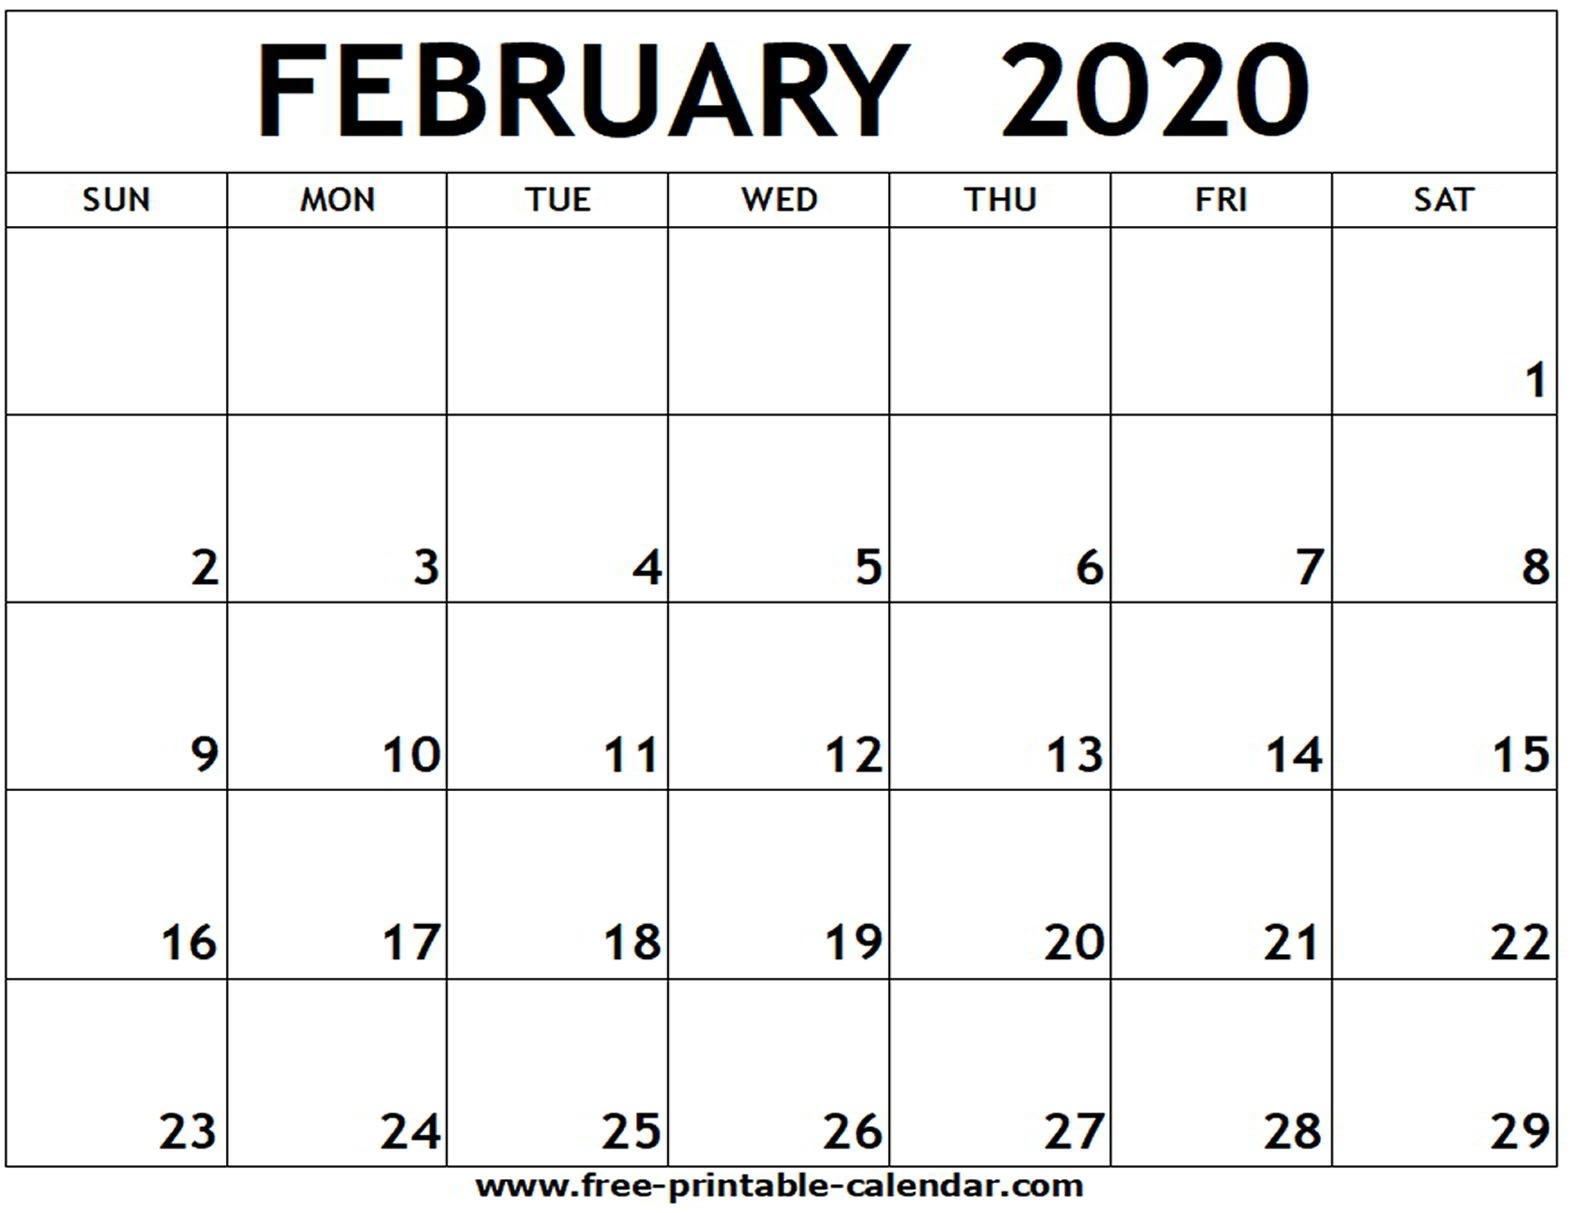 February 2020 Printable Calendar - Free-Printable-Calendar  February 2020 Calendar Printable